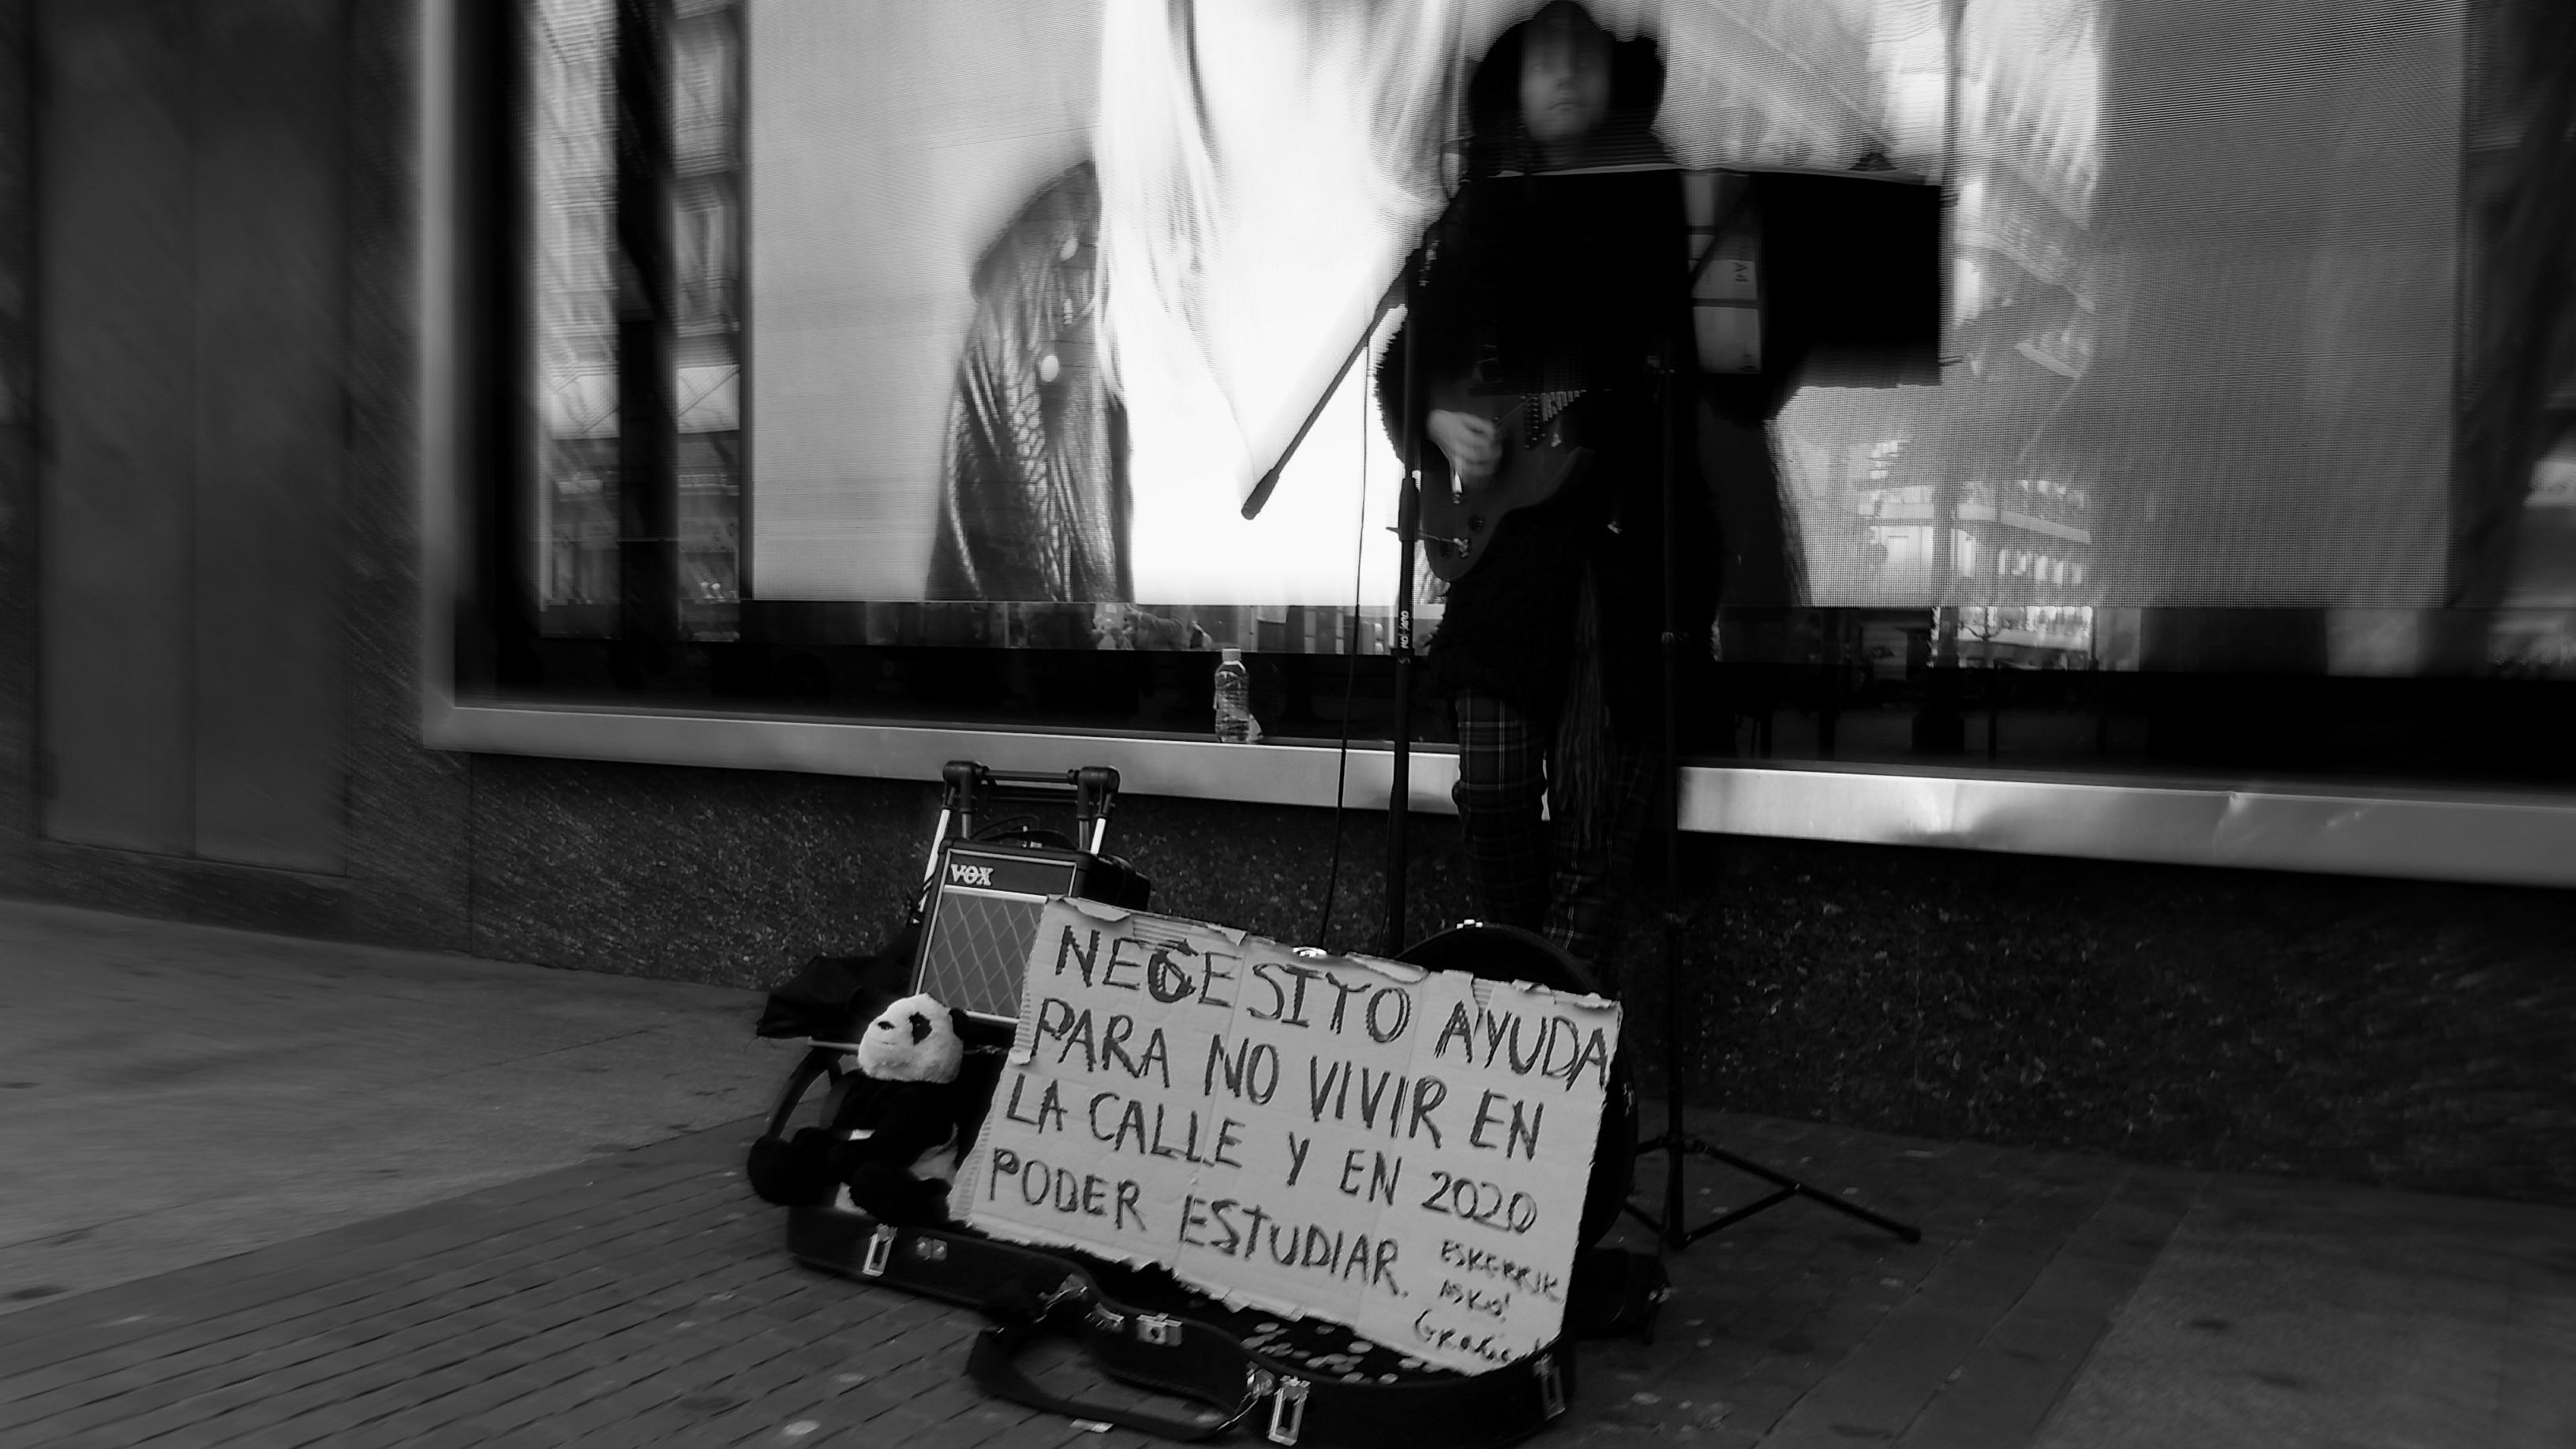 Bilbao, 2019